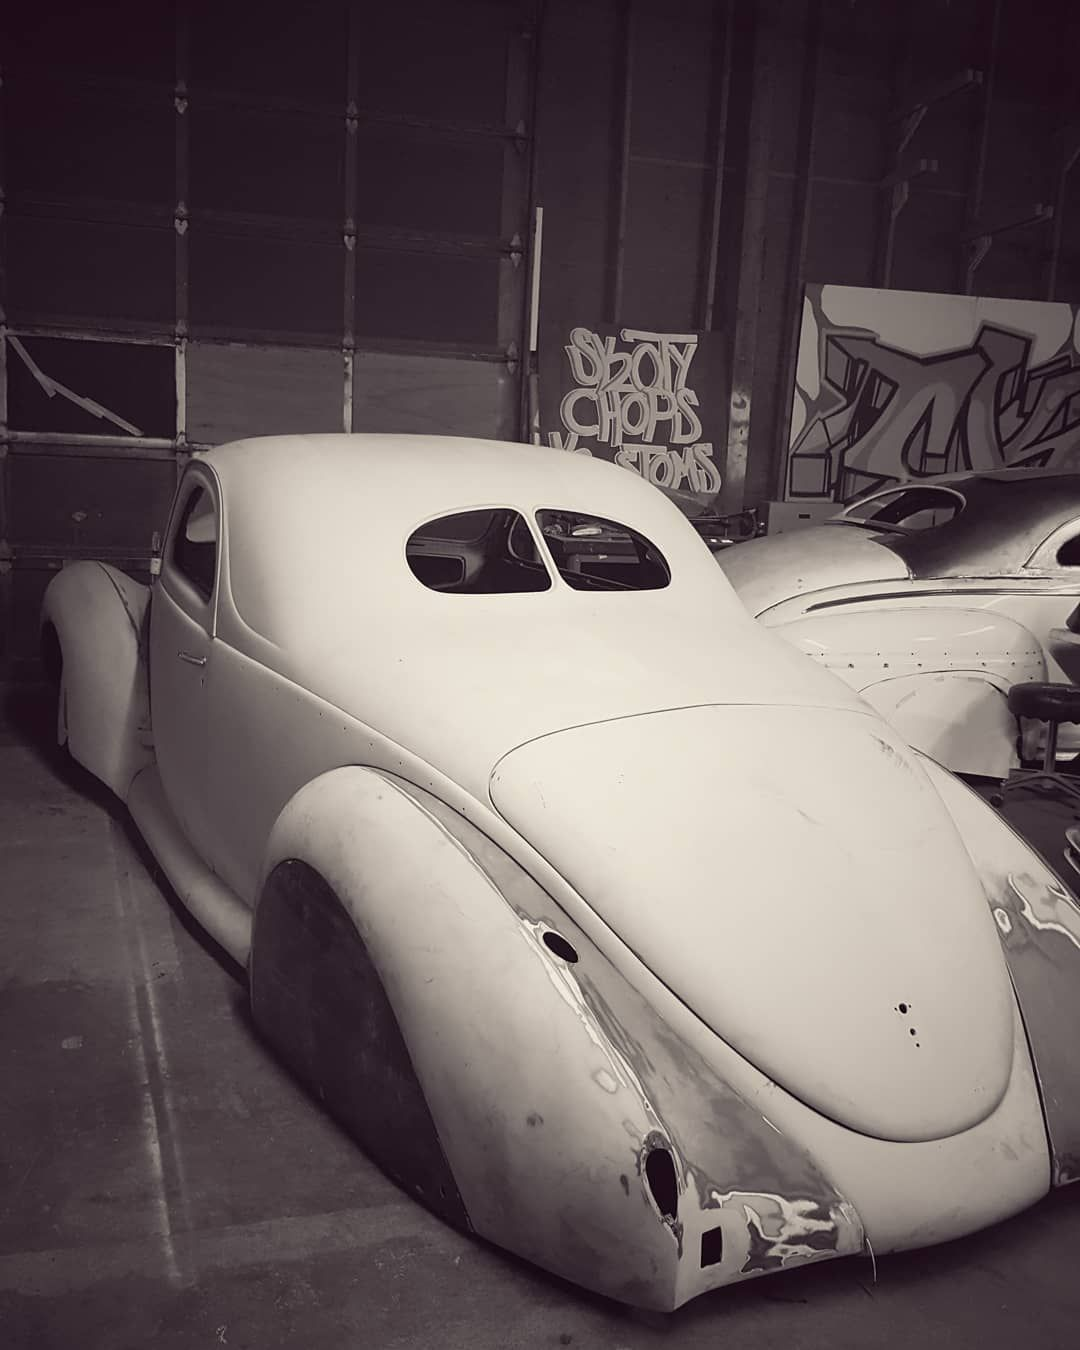 39 Zephyr : zephyr, Skotychops, Zephyr, Bagged, Ready, Home., #lincolnzephyr, #zephyr_society, #taildragger, #1939…, Custom, Cars,, Lincoln, Zephyr,, Sports